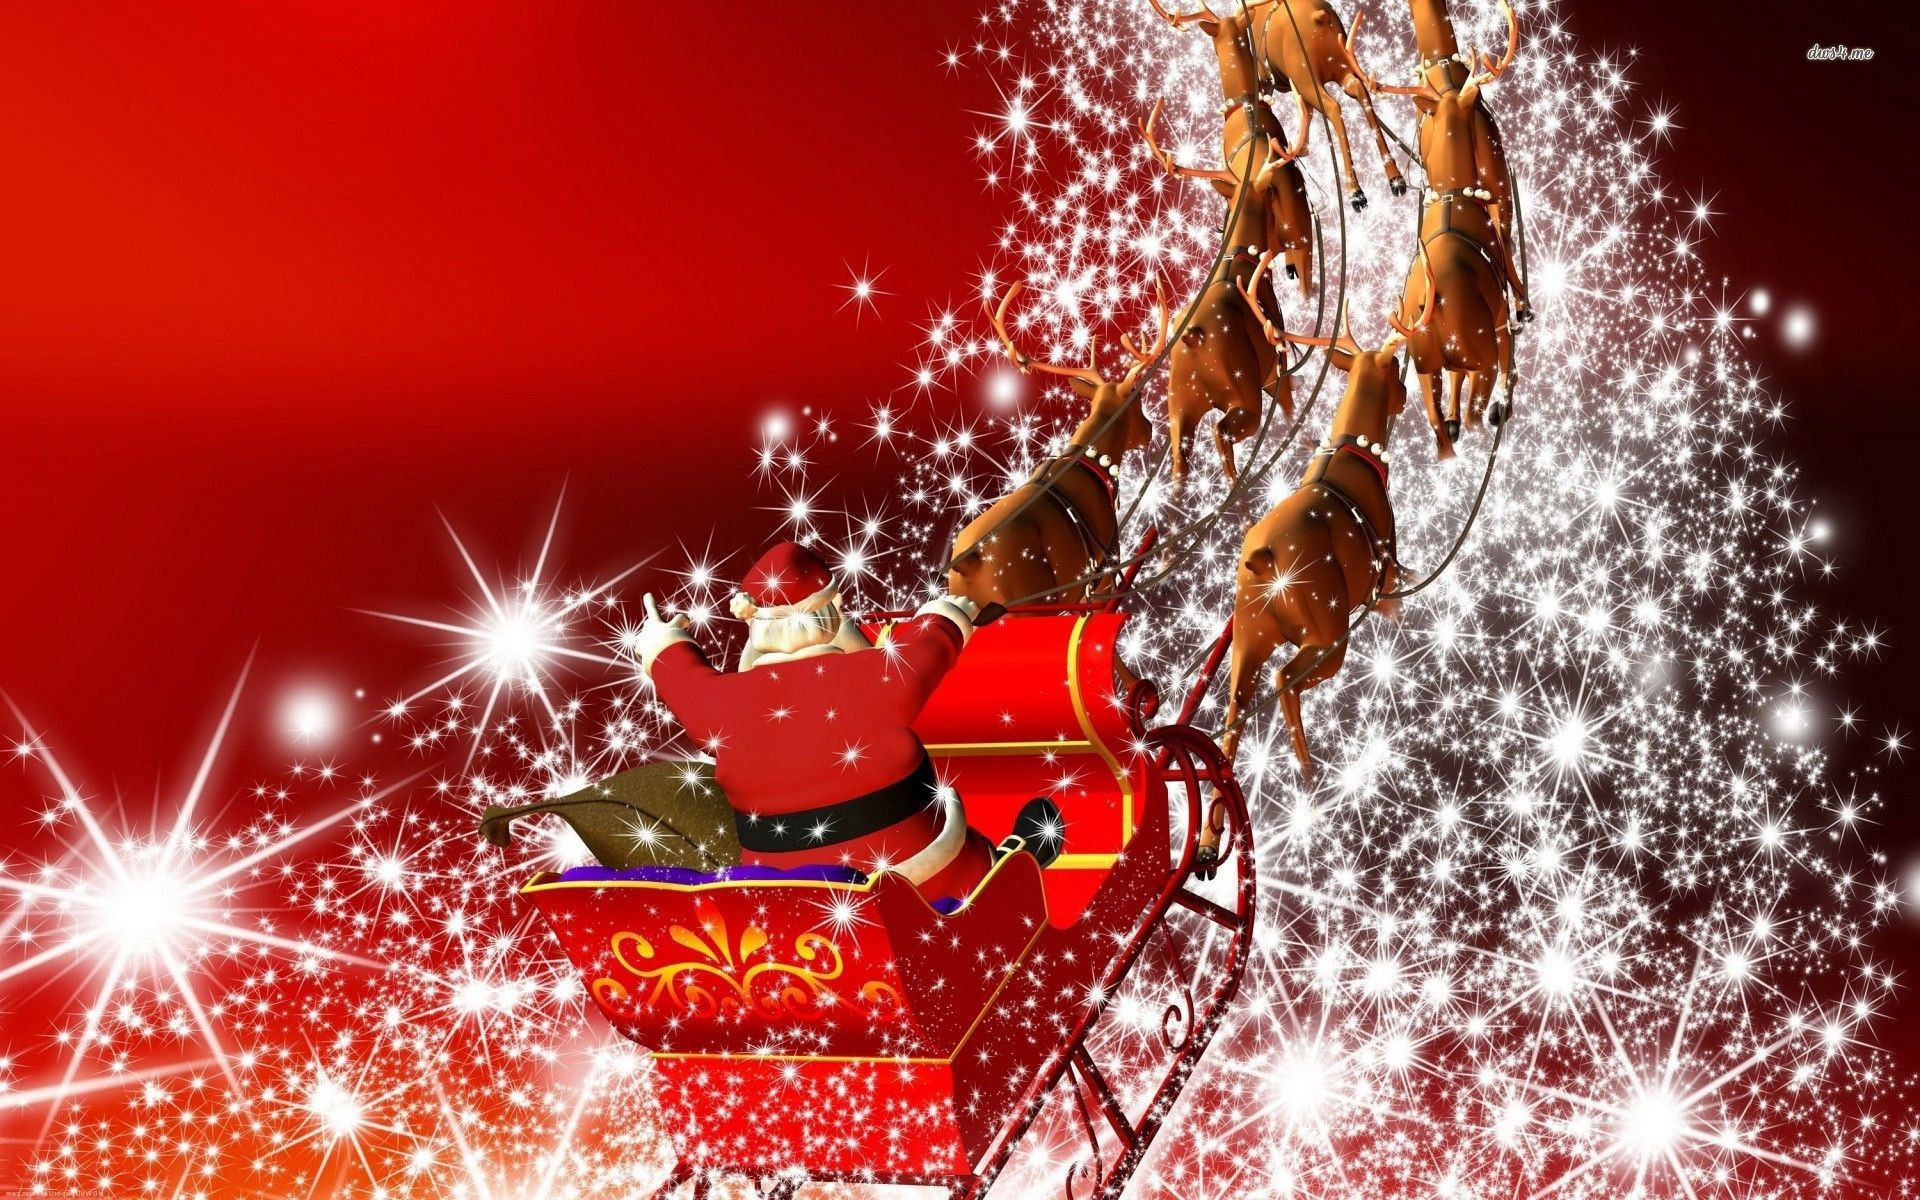 Santa Claus Wallpaper (14)